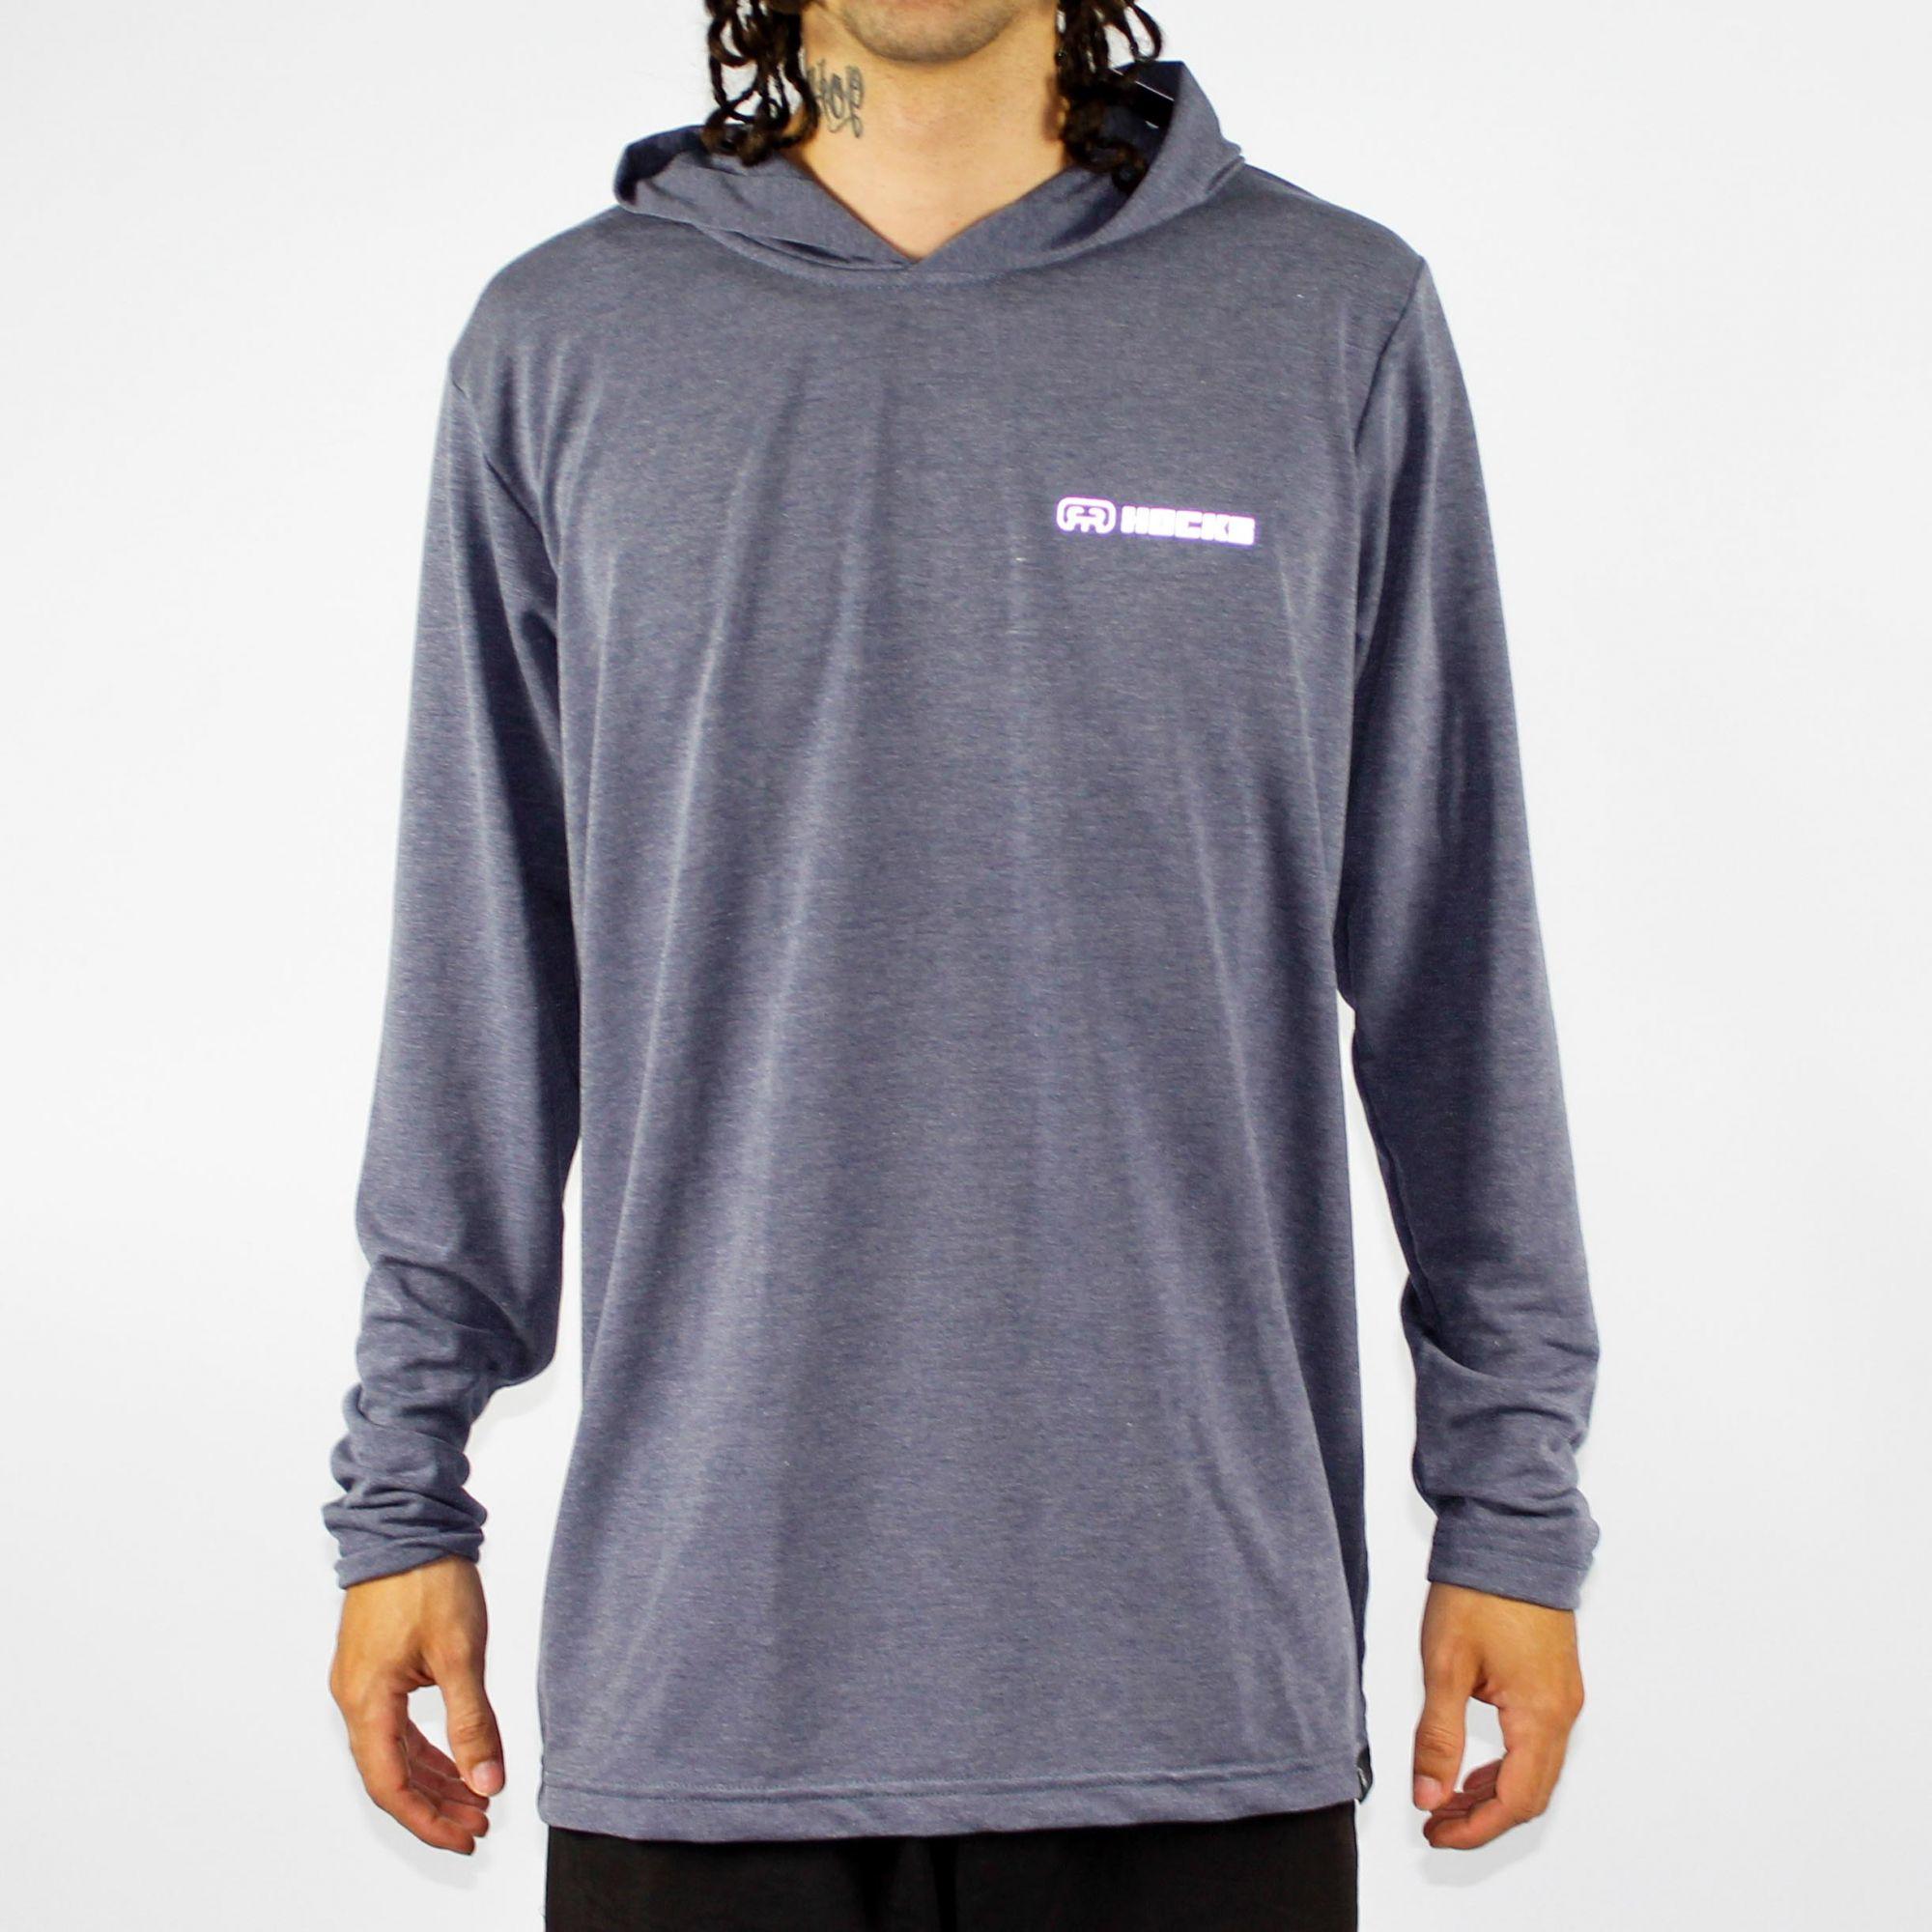 Camiseta Manga Longa Hocks Lash Cinza/Azul Marinho